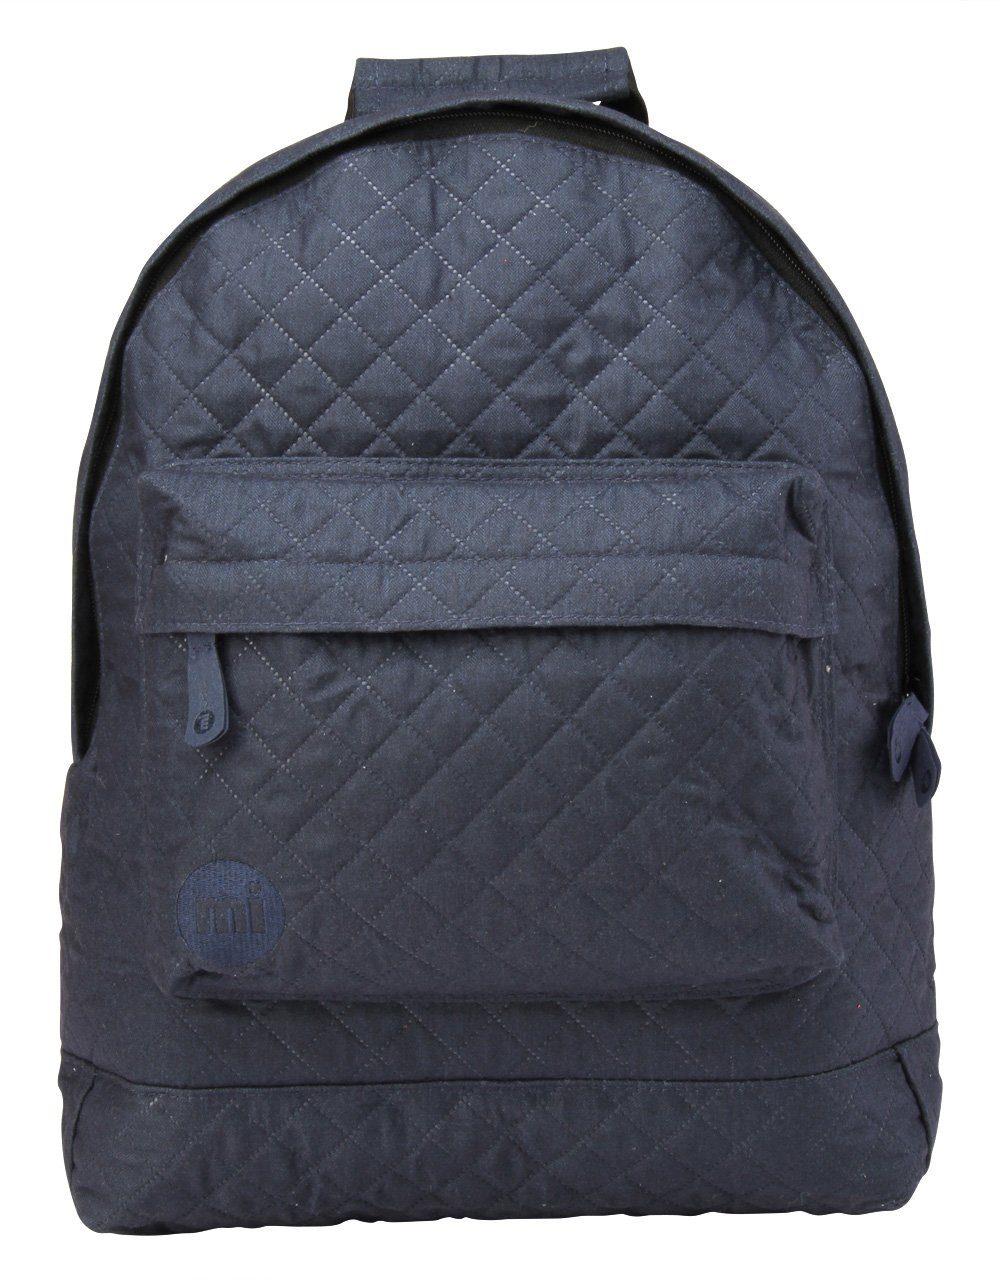 mi pac. Rucksack mit Laptopfach, »Backpack, Quilted Navy«